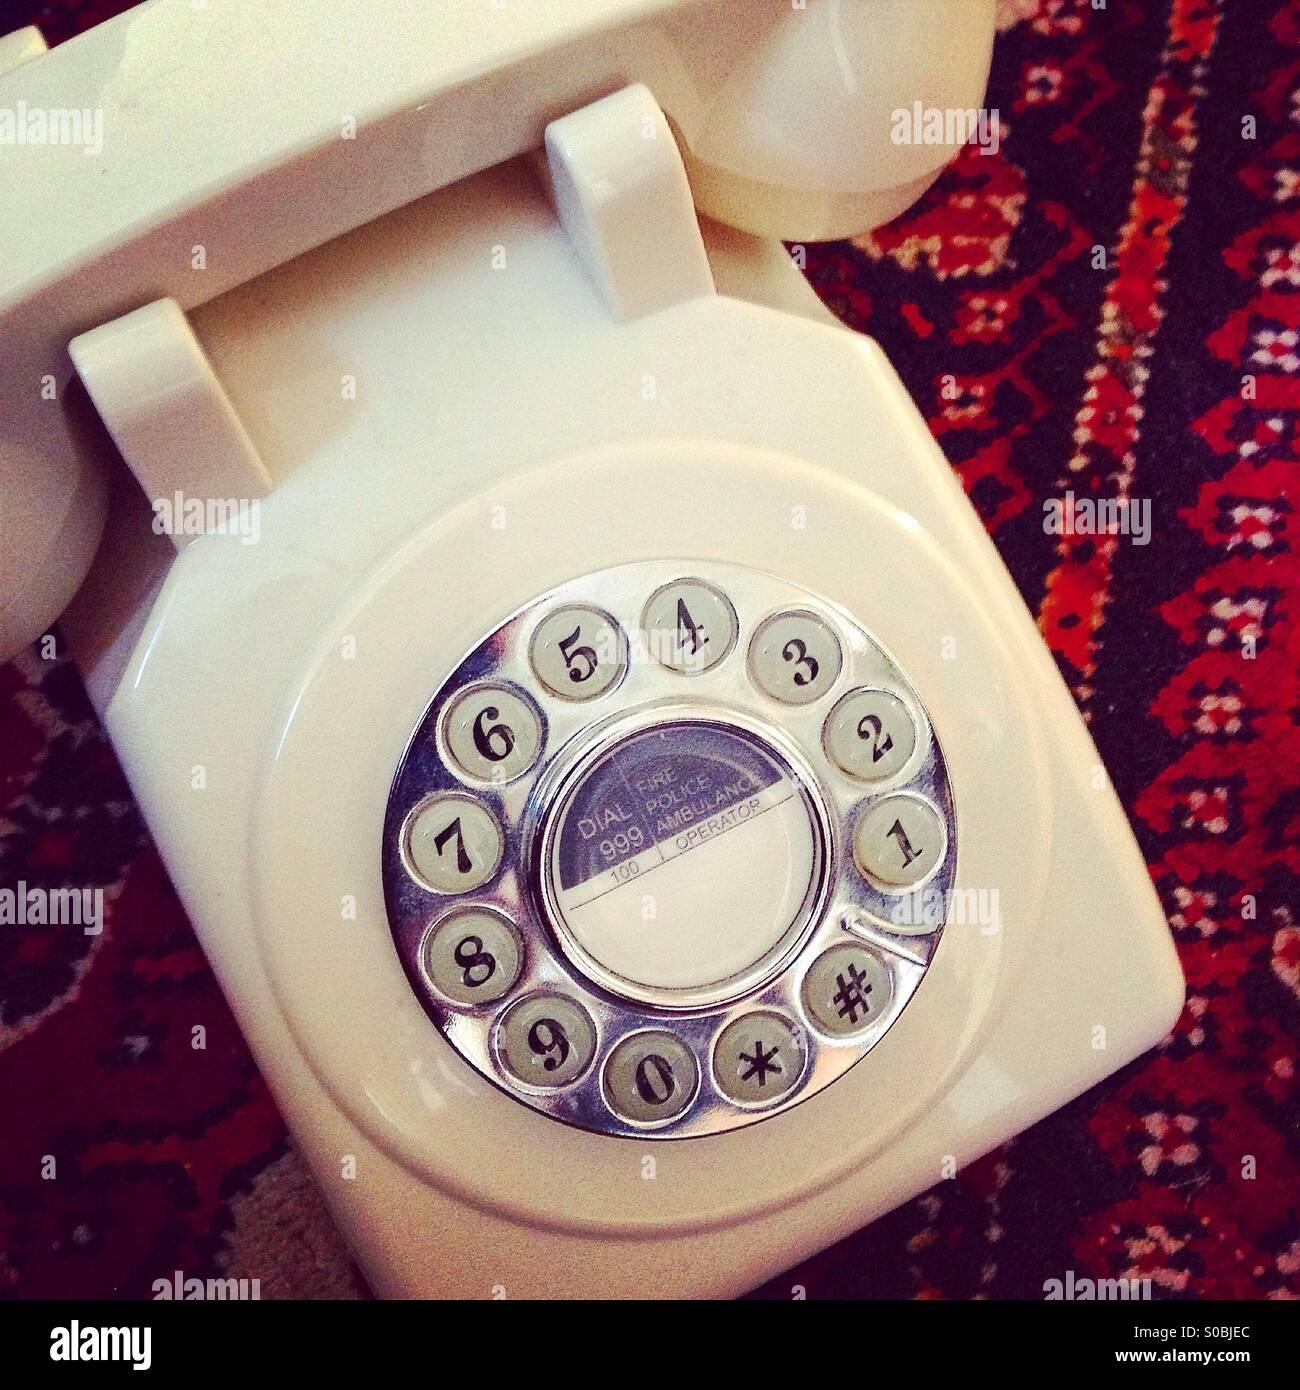 Vintage style Telephone - Stock Image